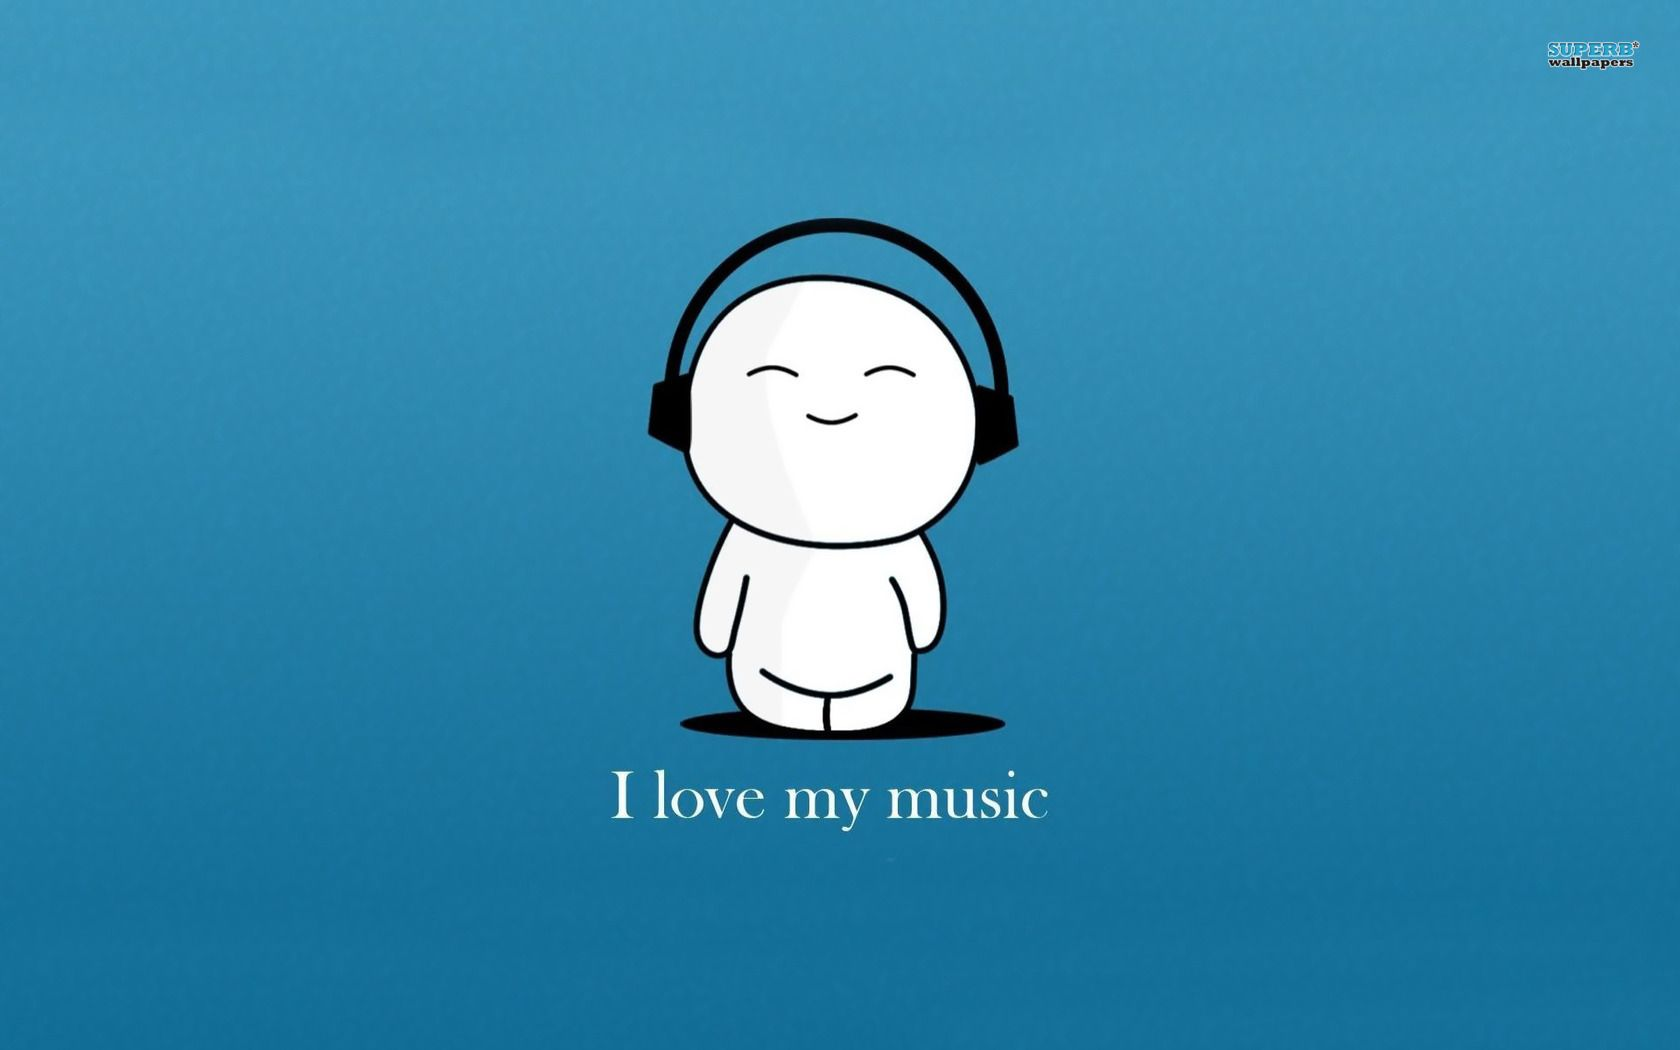 I Love Music True Xd Music Wallpaper 36556275 Fanpop Music Wallpaper Cartoon Wallpaper Wallpapers Cartoon